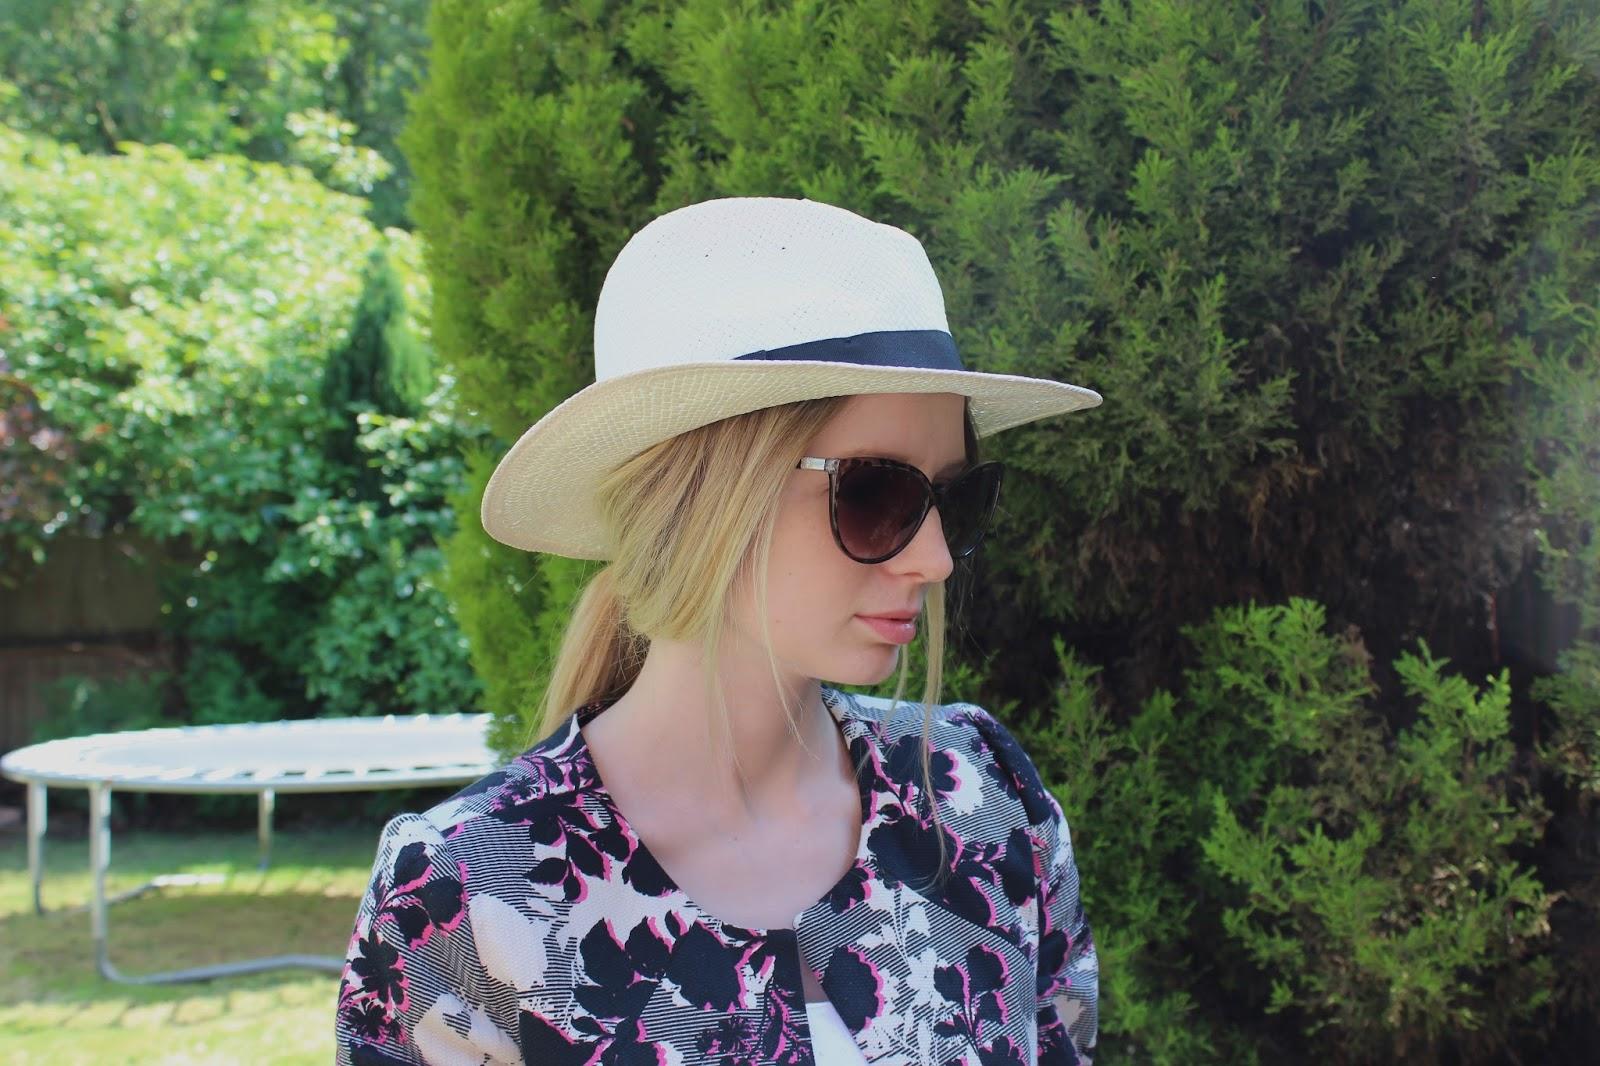 Close up of panama hat and sunglasses